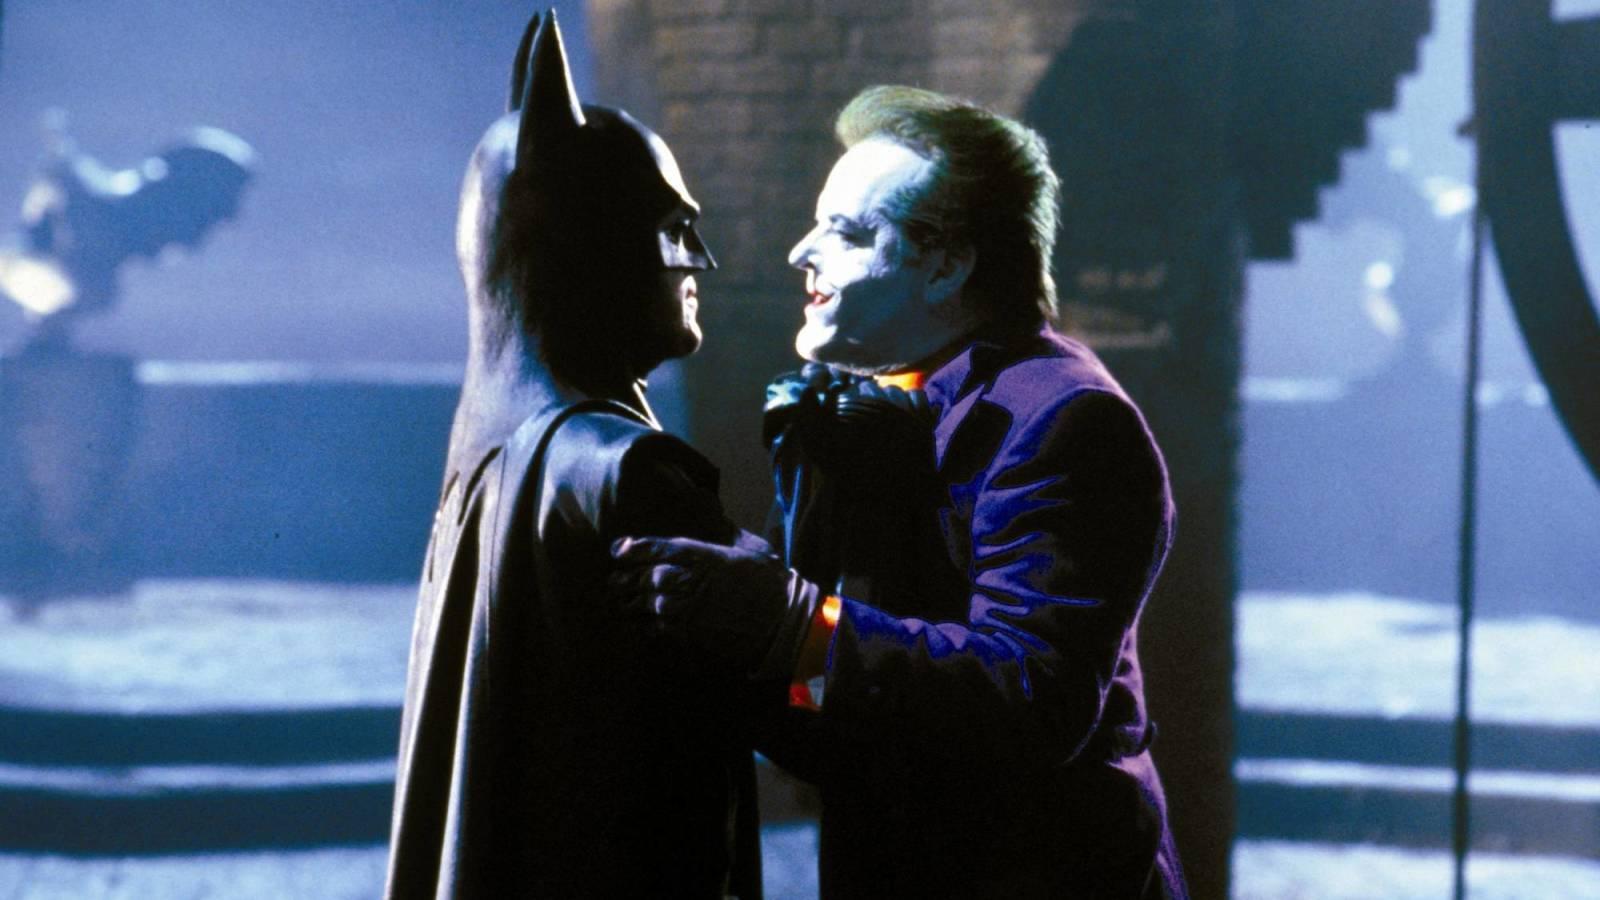 Every 'Batman' movie, ranked